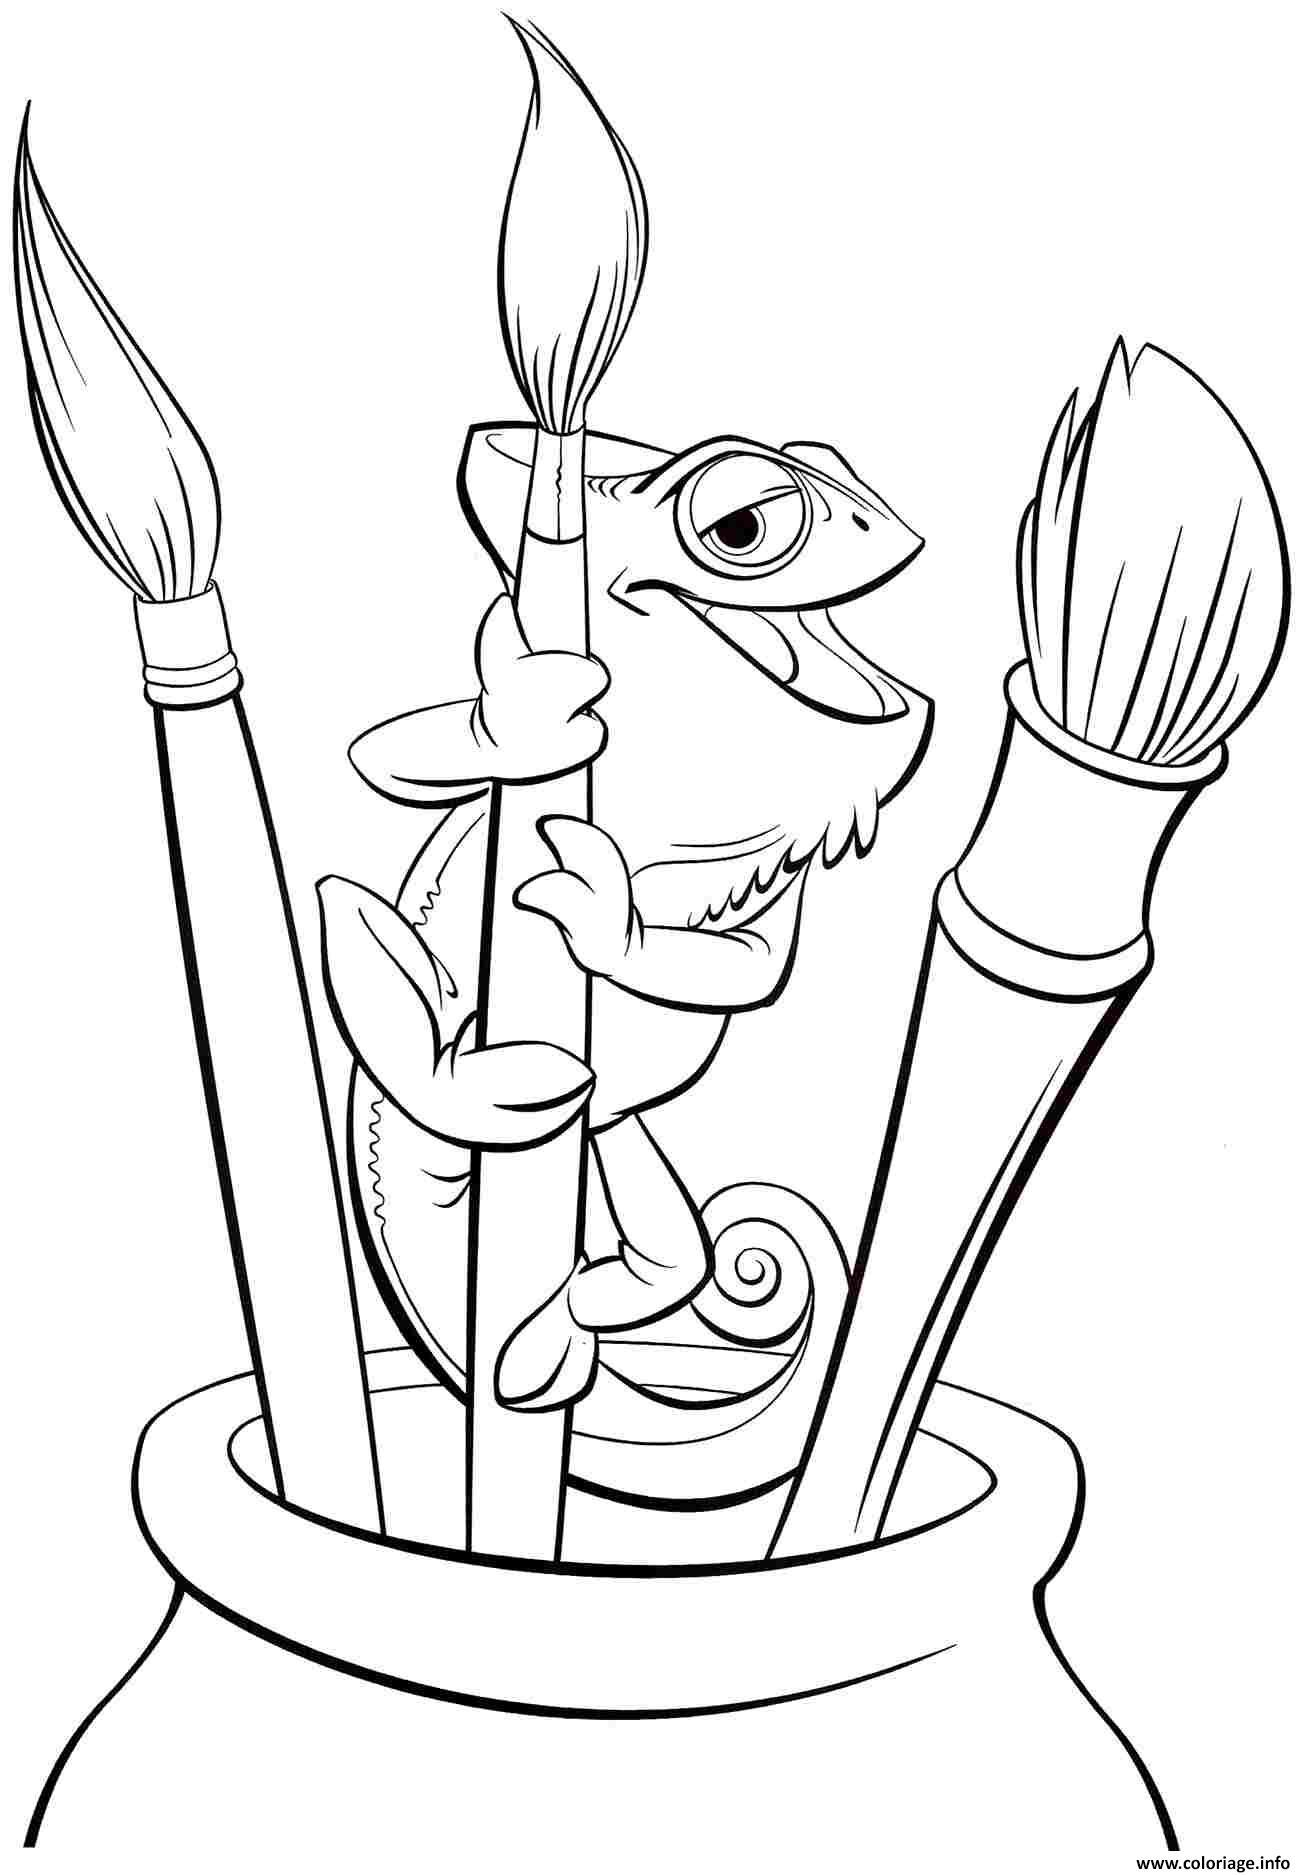 Coloriage raiponce pascal aime la peinture - Dessin raiponce ...